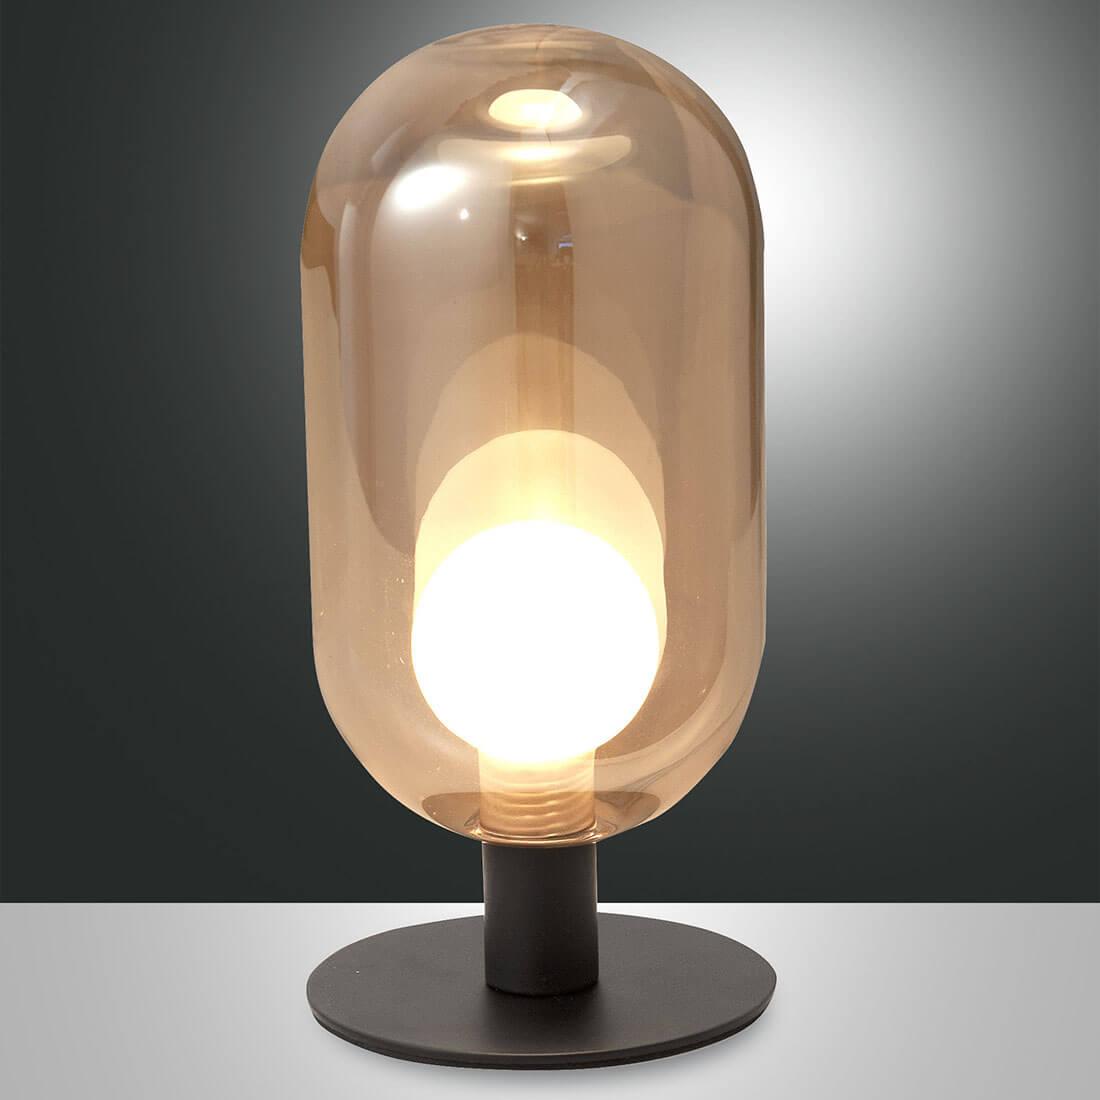 Настолна лампа Gubbio I